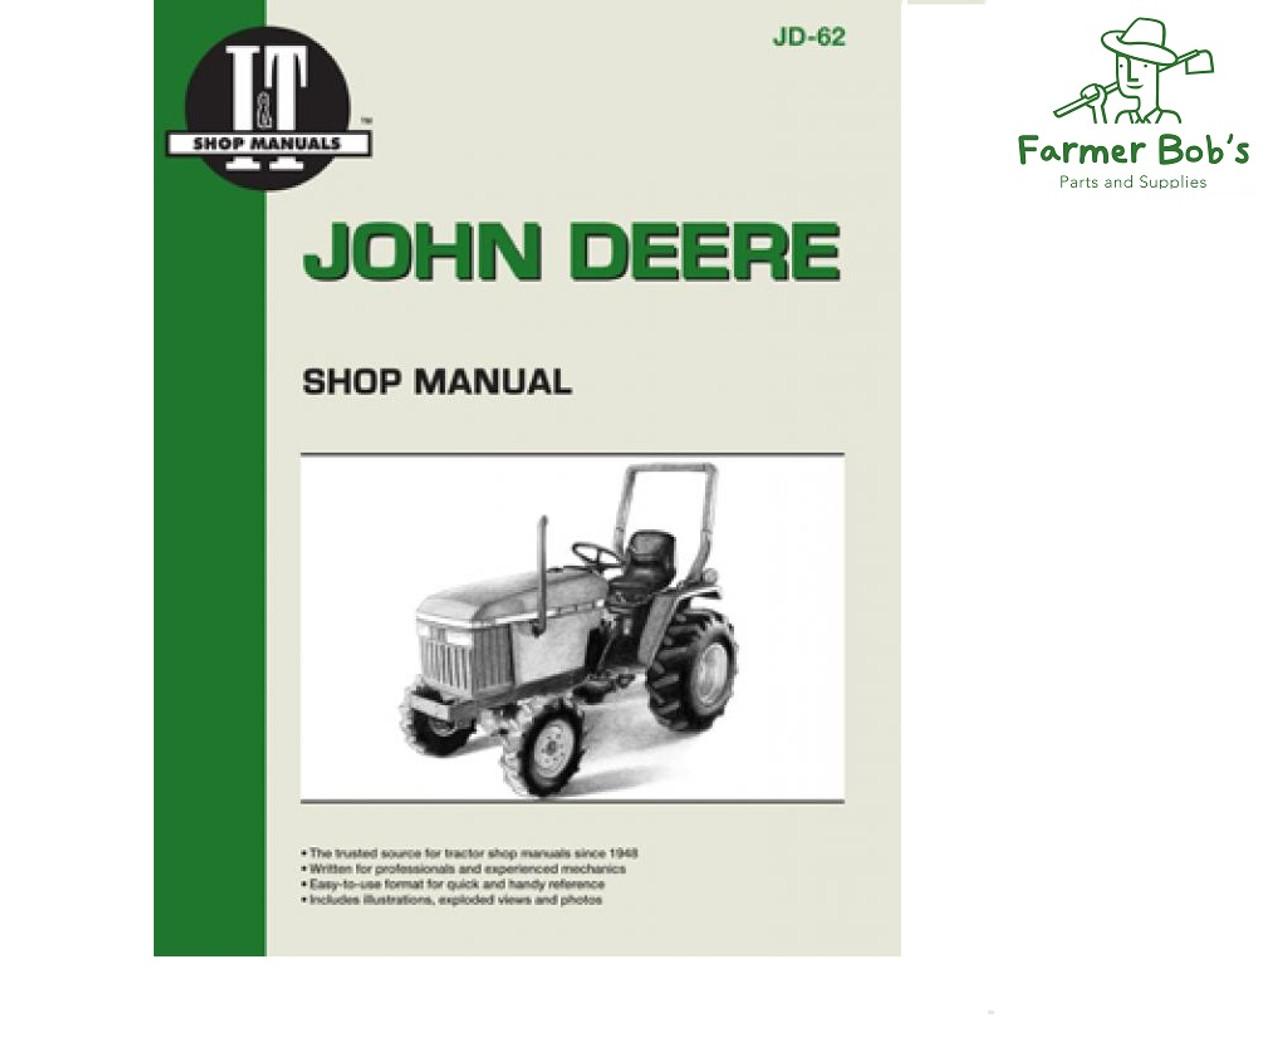 hight resolution of jd62 i t shop manuals john deere 670 770 870 970 and 1070